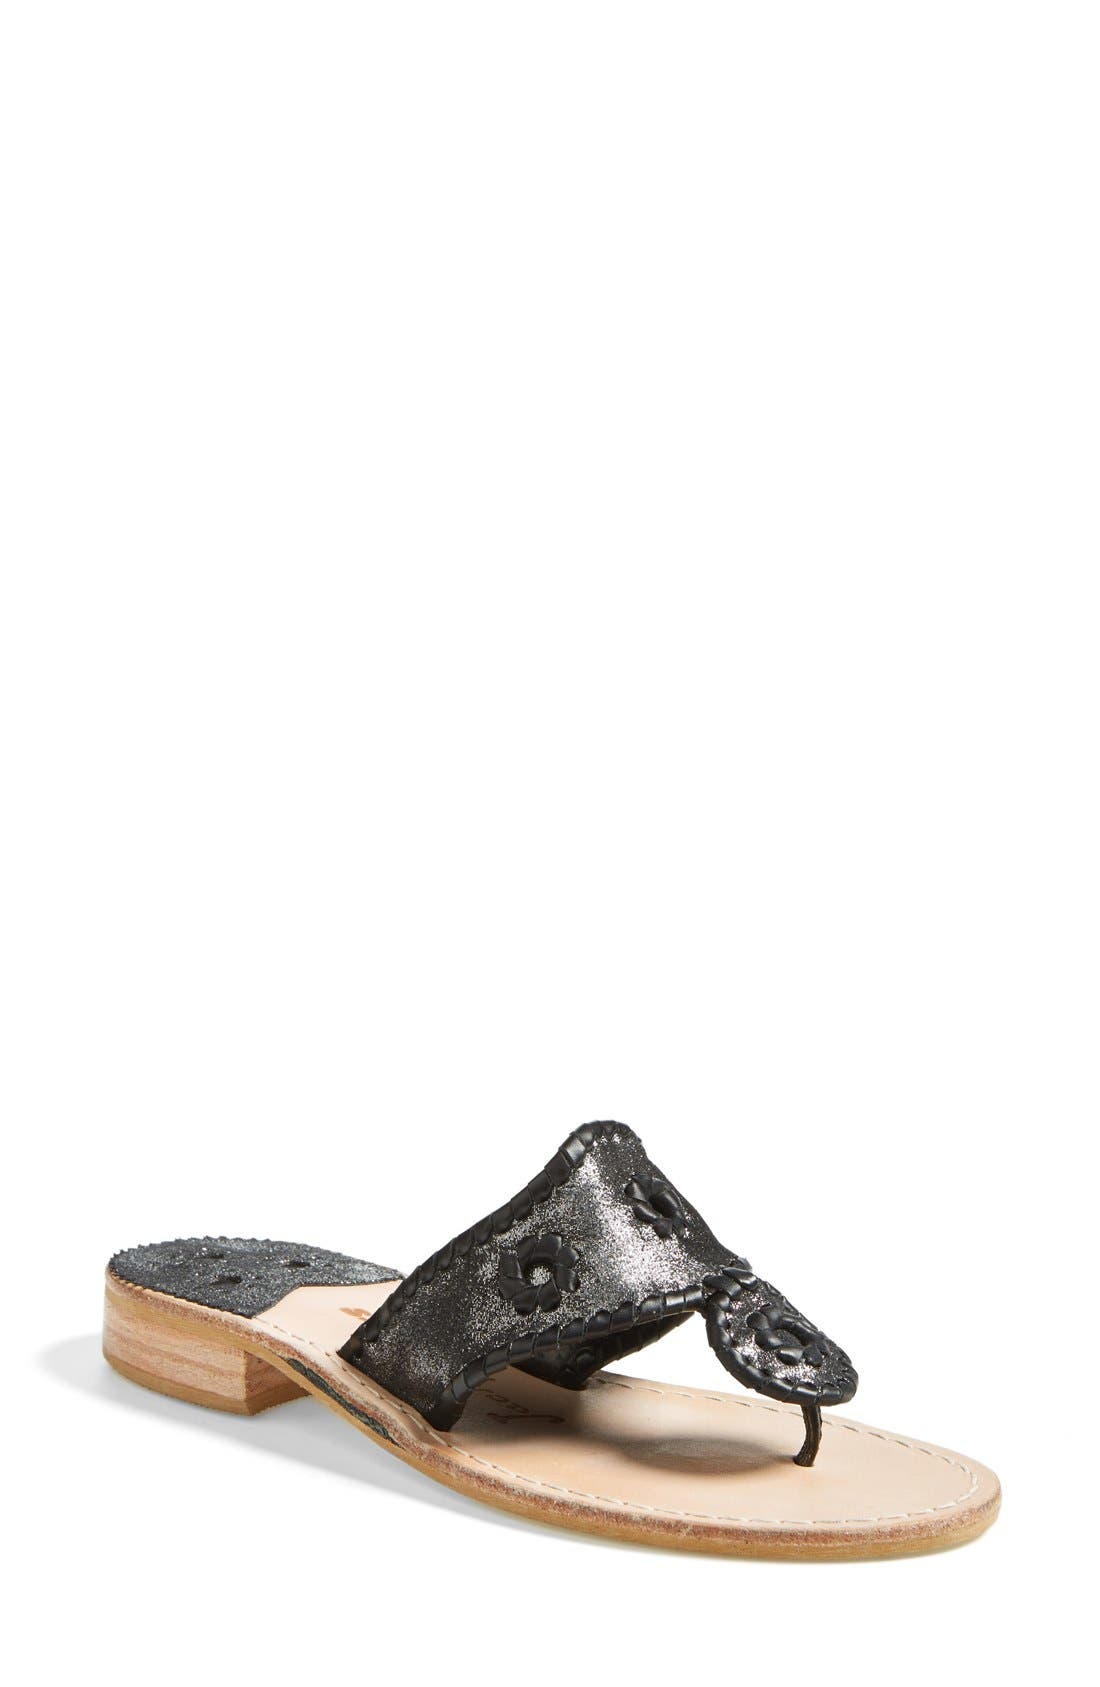 Alternate Image 1 Selected - Jack Rogers 'Stardust' Thong Sandal (Women)